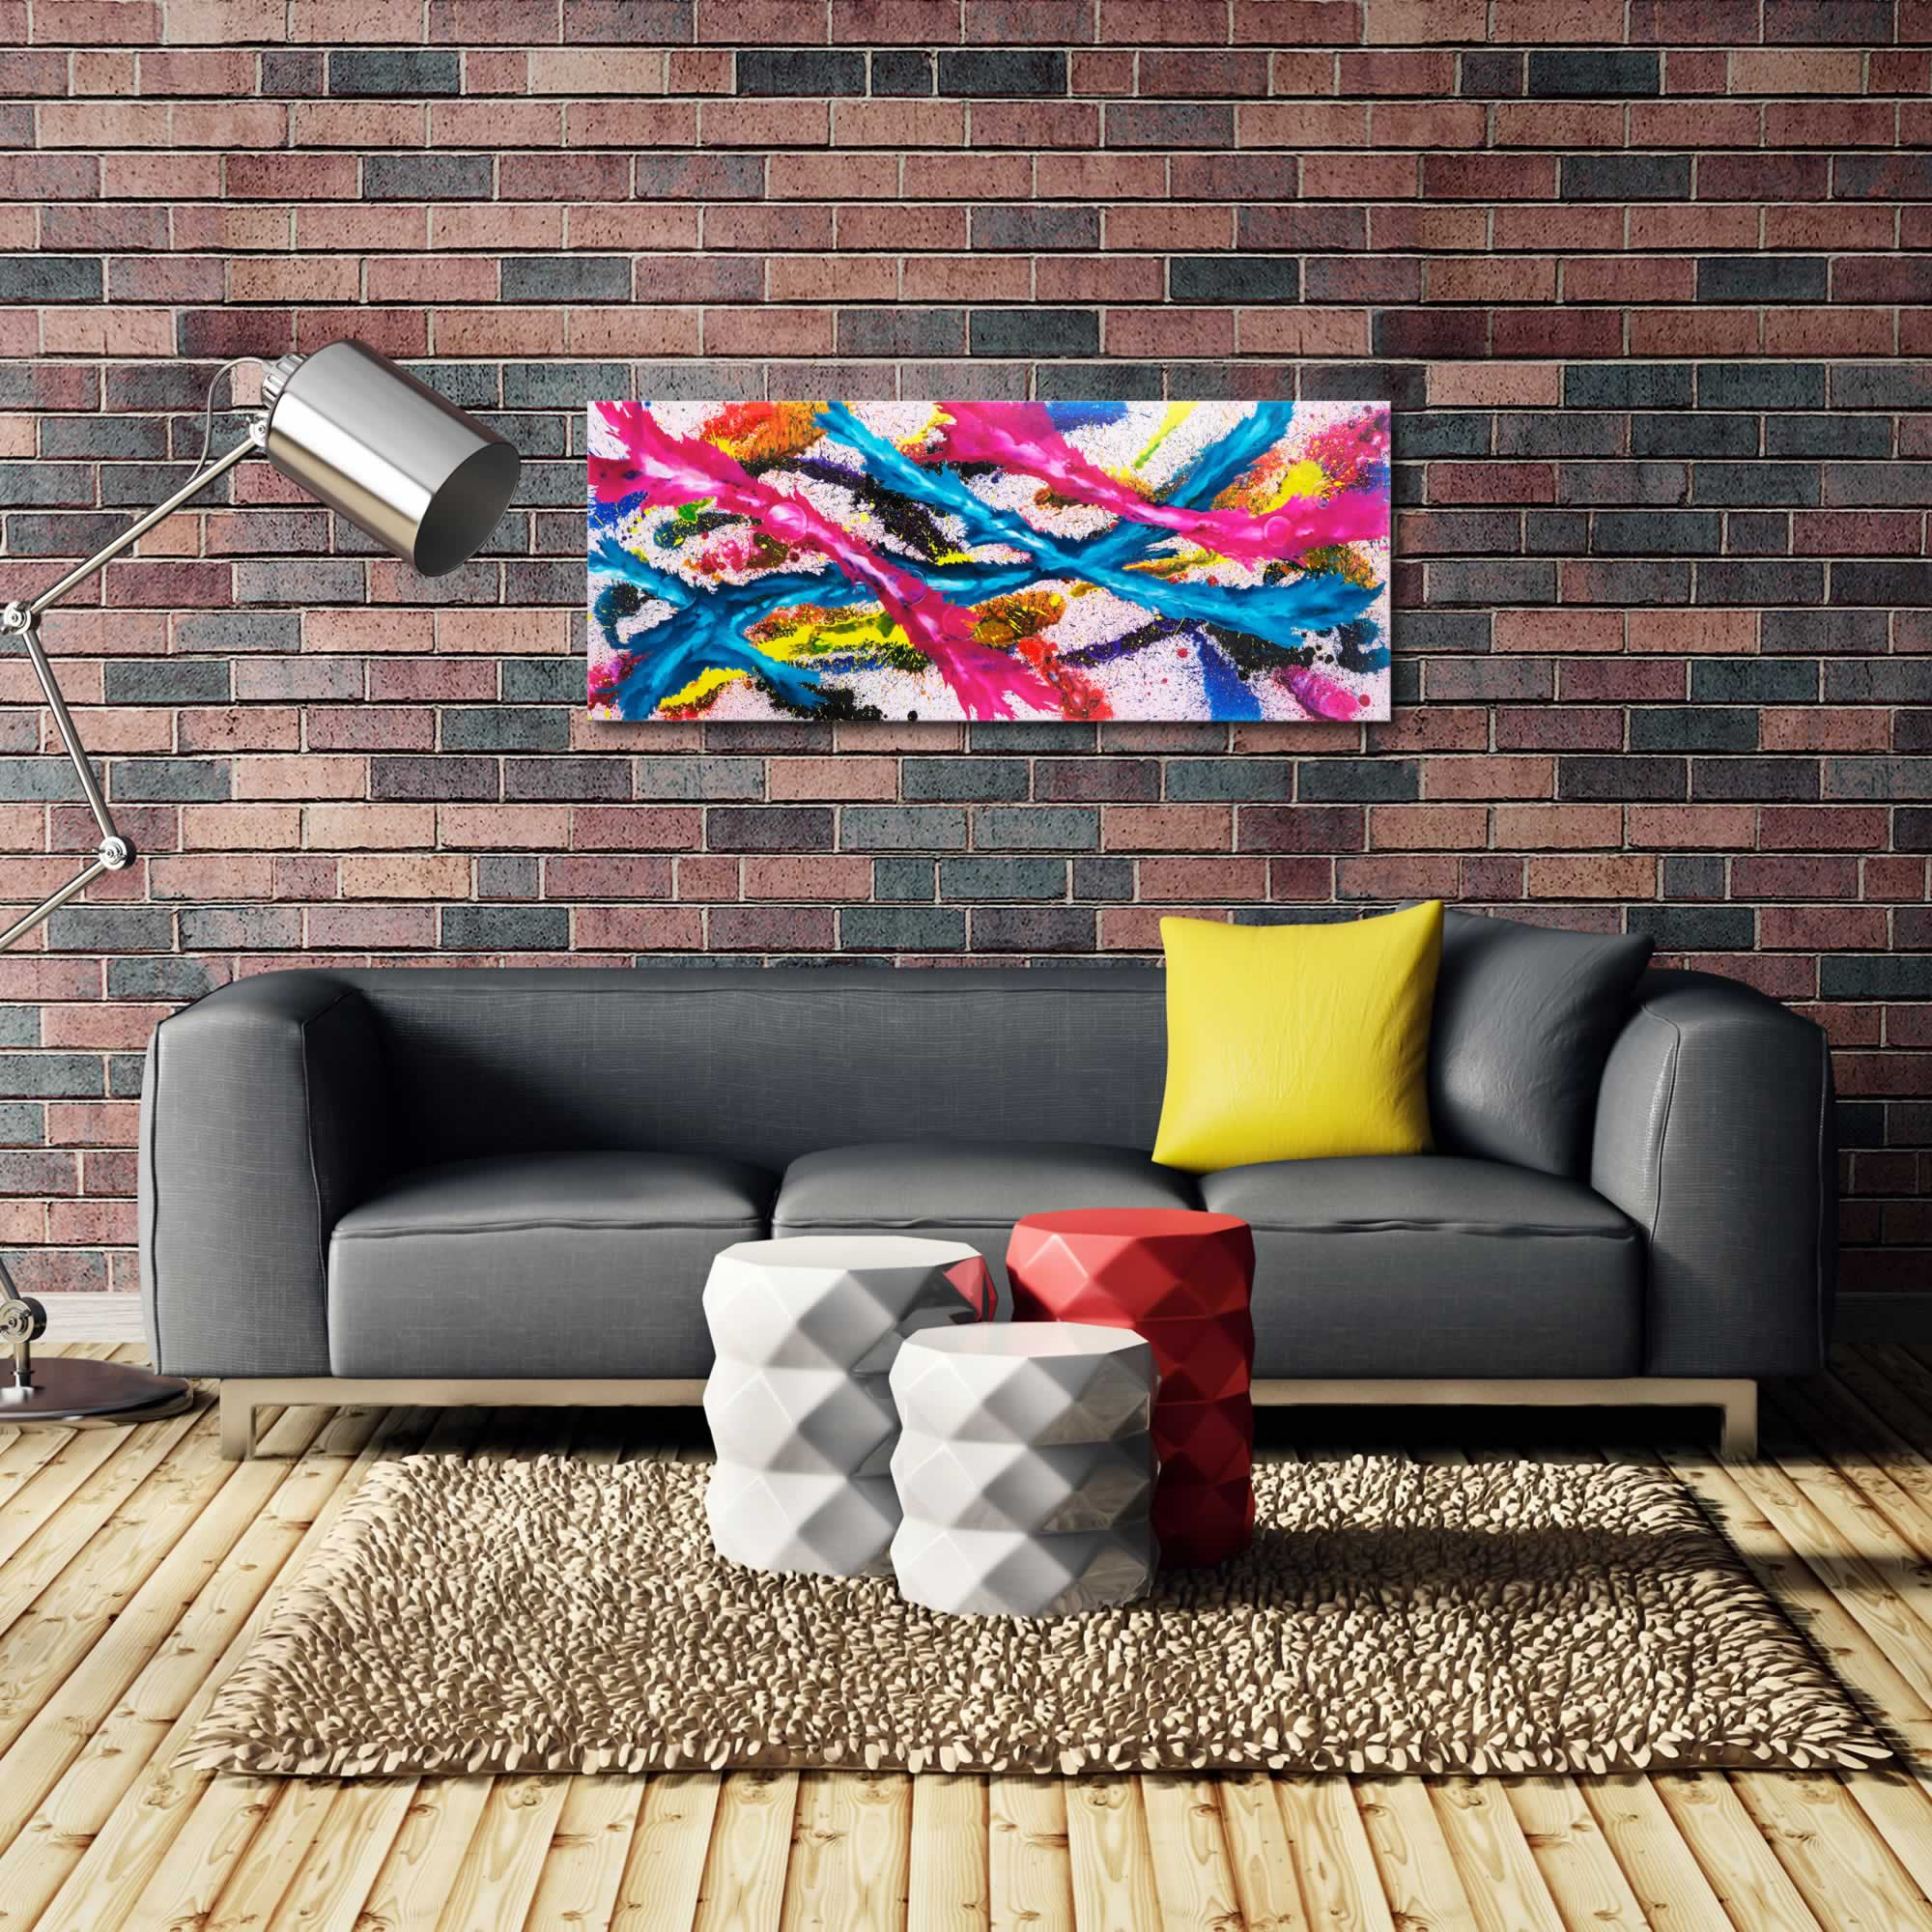 Splash Colorful Room Wall: Metal Art Studio - Color Splash